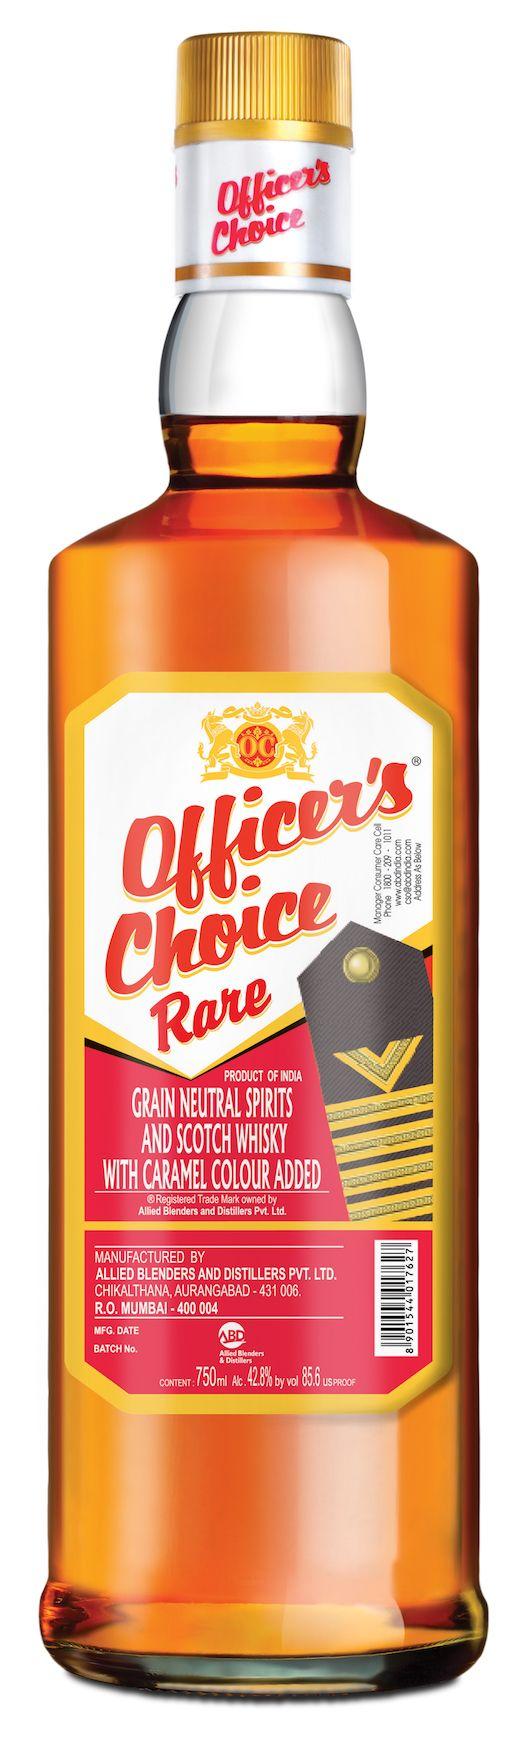 Top selling whiskies in the world #scotch #whisky #whiskey #malt #singlemalt #Scotland #cigars